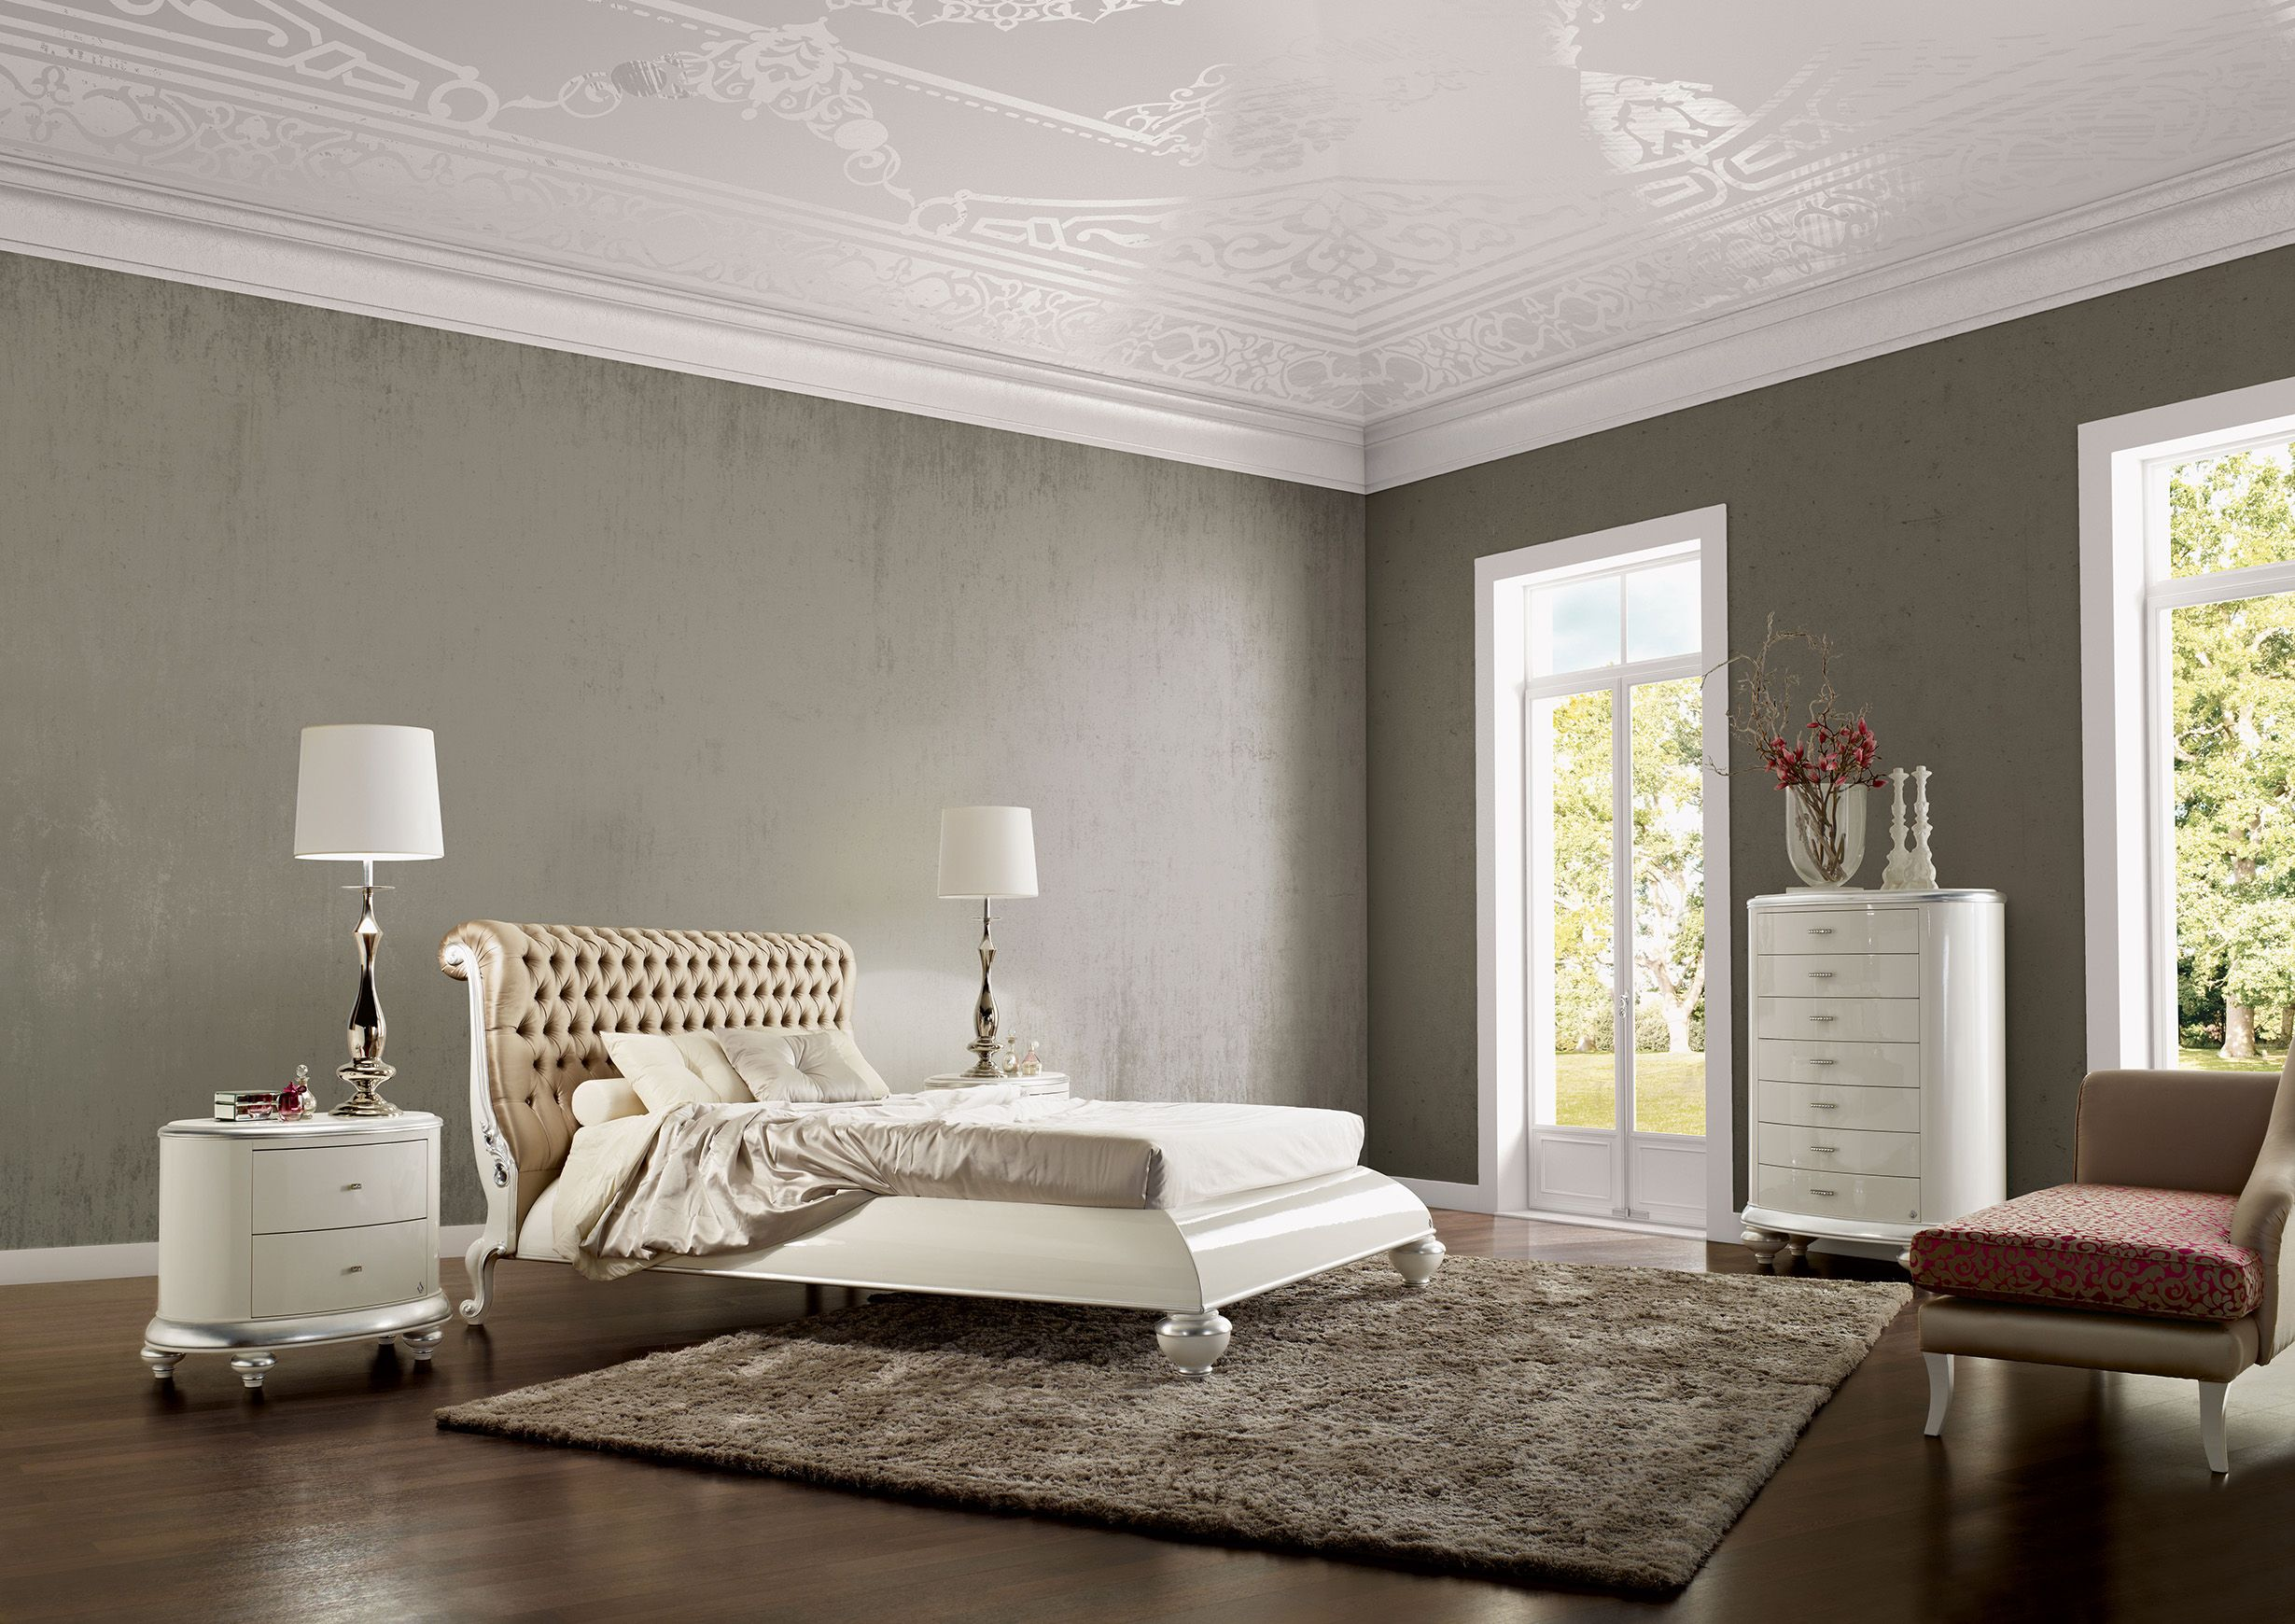 Luxury Interior Design Bedroom Venezia Buttoned Bed Jetclass Real Furniture Luxury Interior